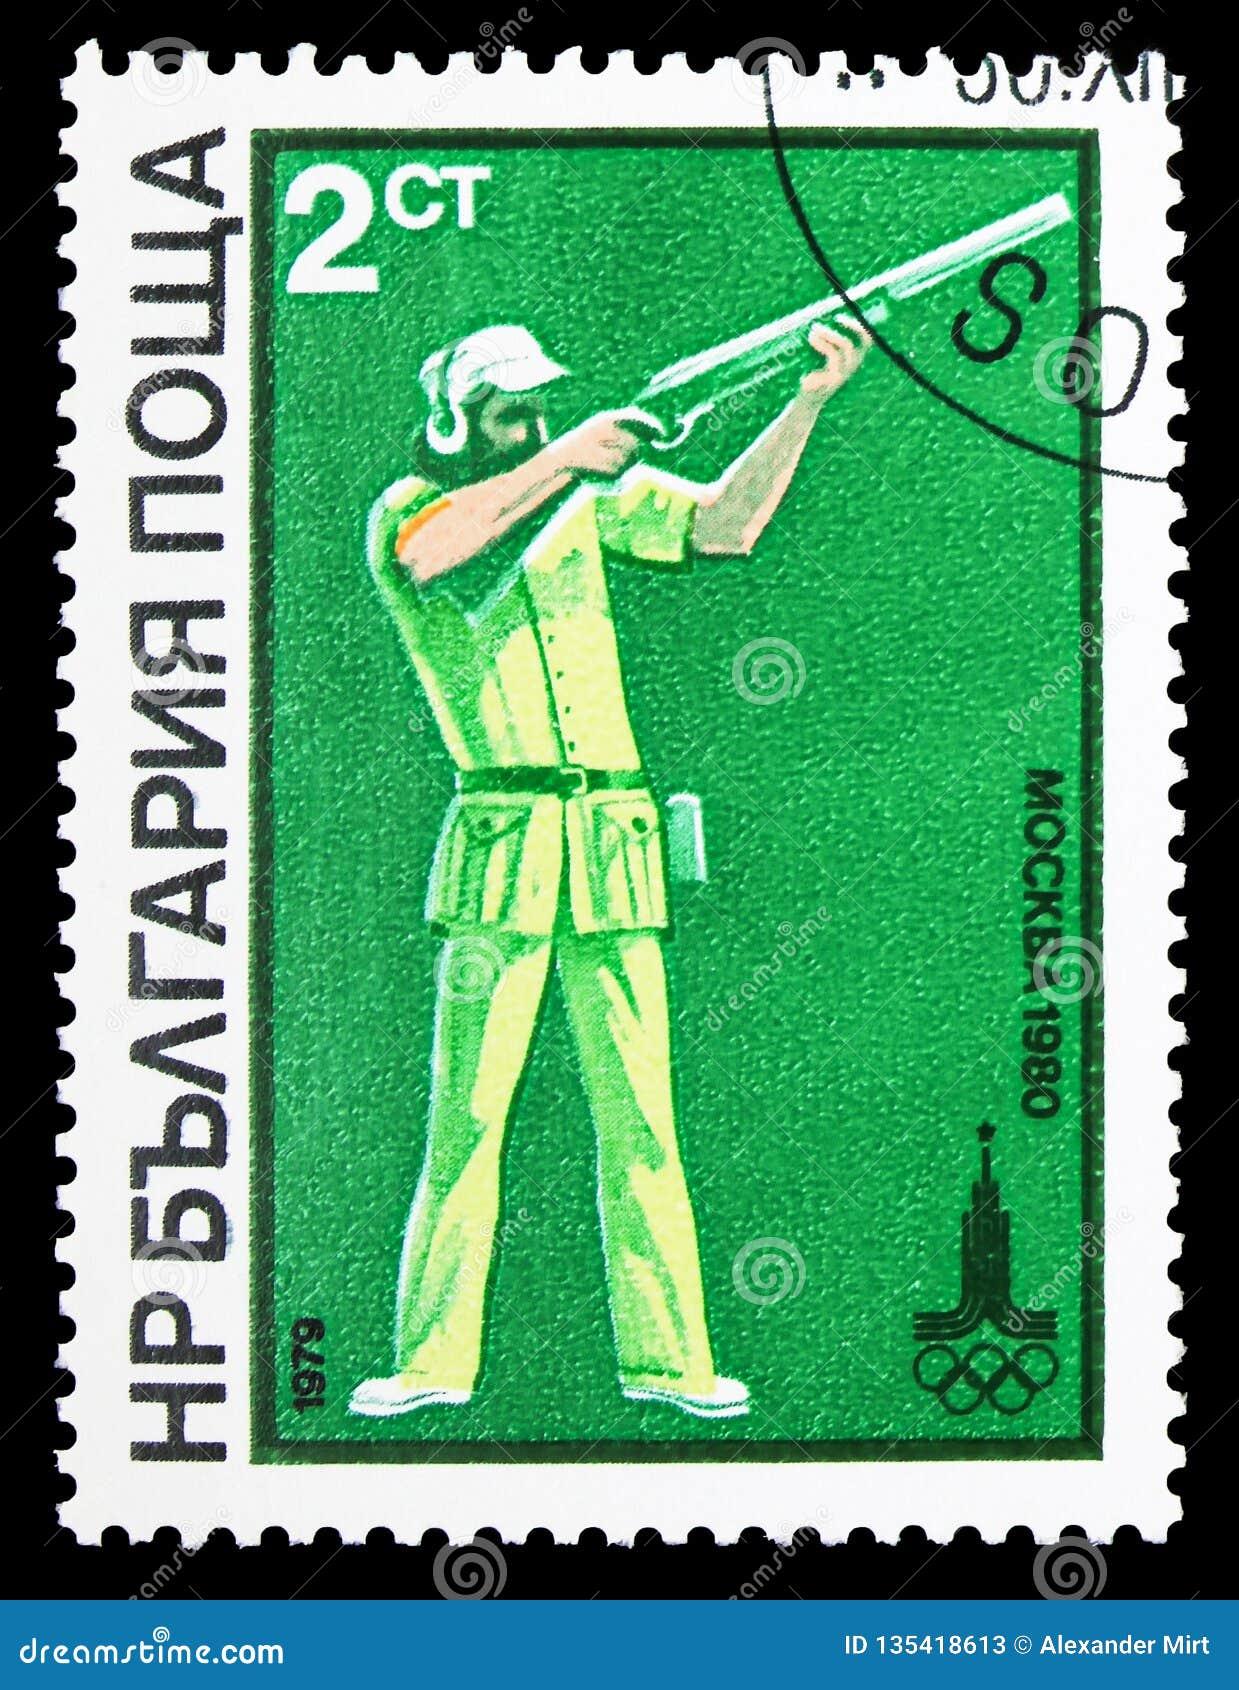 Skeet-πυροβολισμός, θερινοί Ολυμπιακοί Αγώνες το 1980, Μόσχα (iv) serie, circa 1979